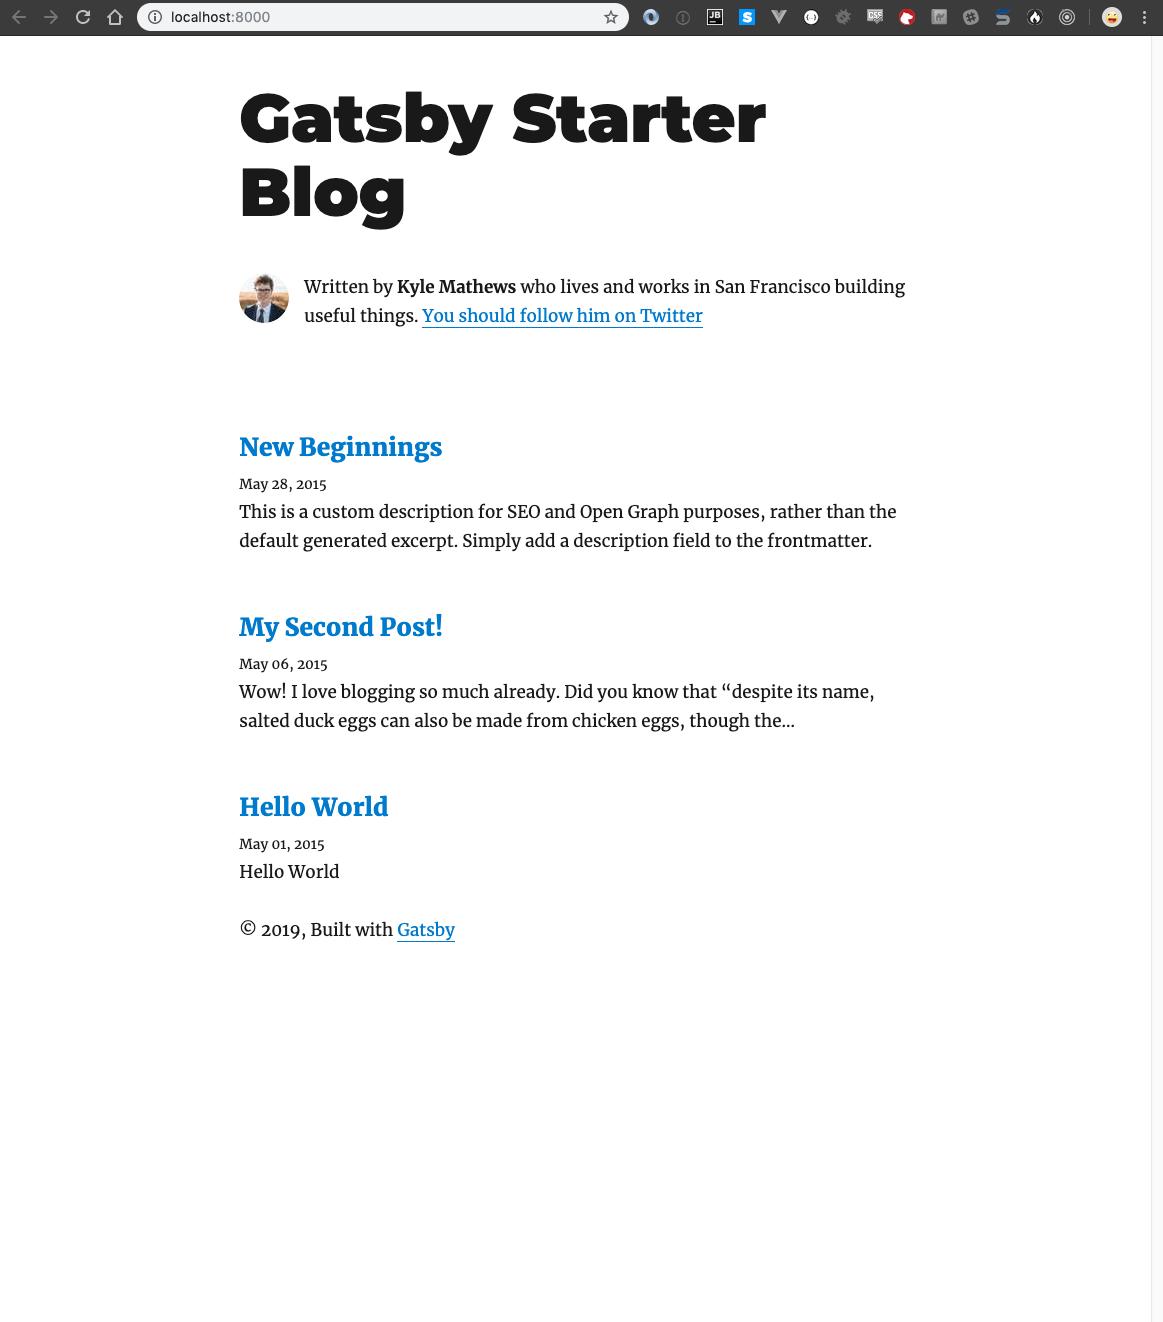 Gatsby Starter Blog page